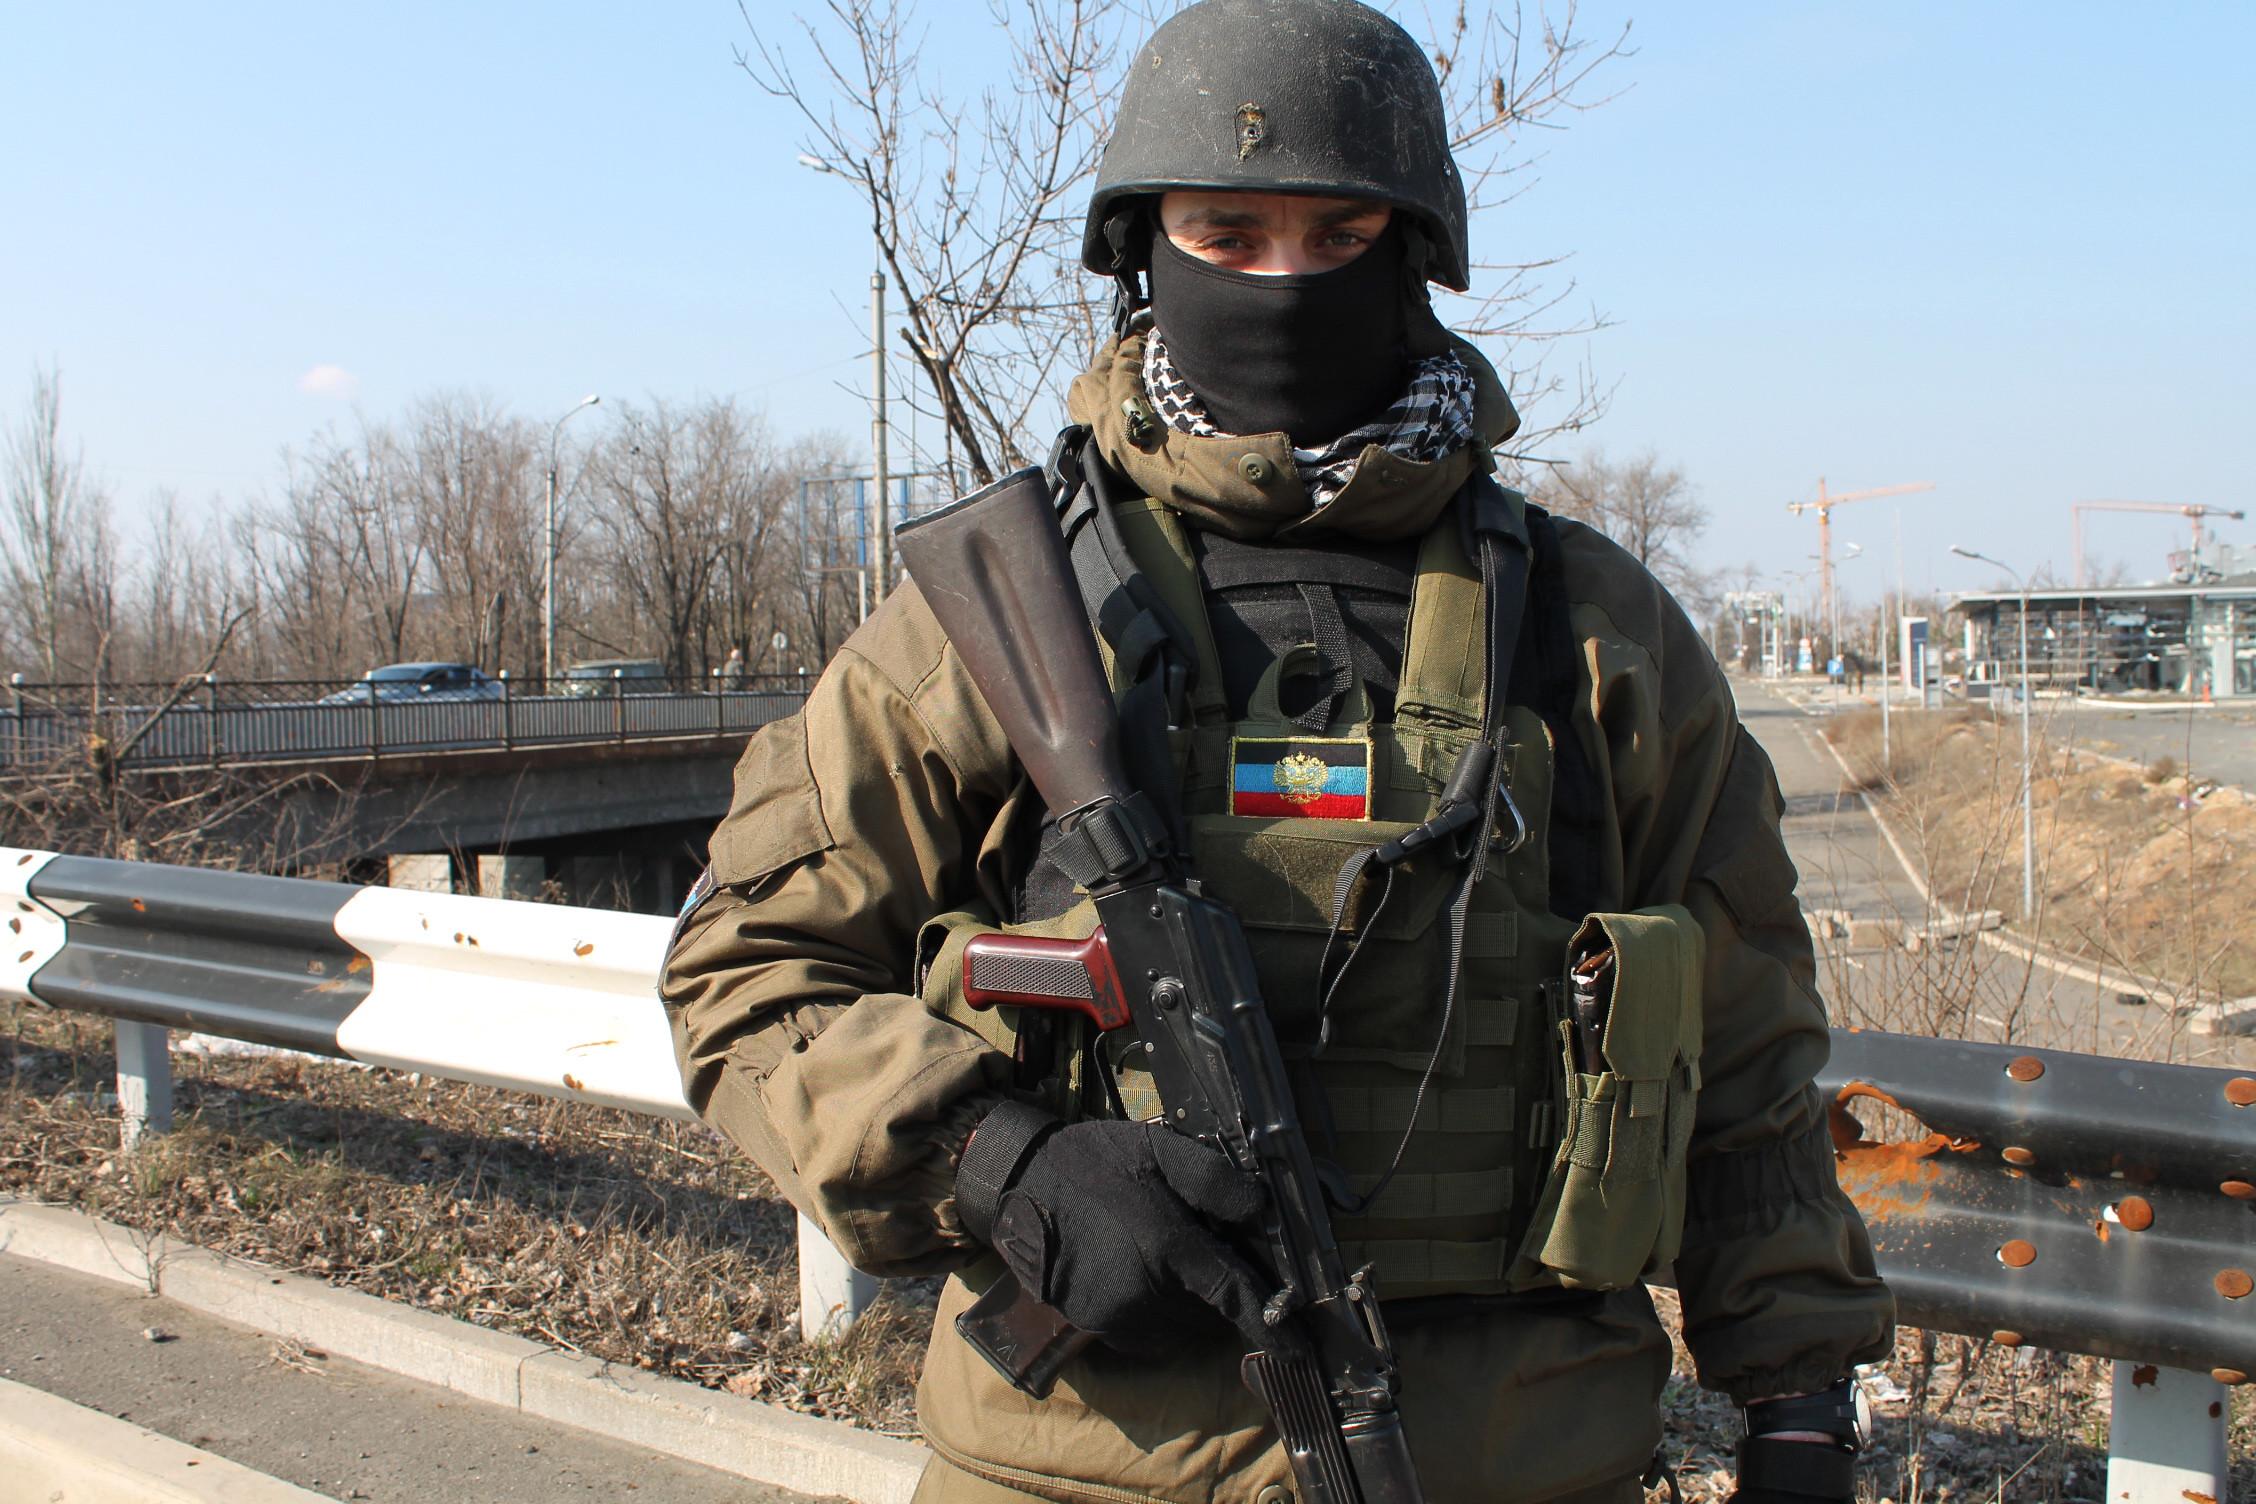 <p>Солдат ДНР. Фото: &copy; РИА Новости/Ирина Геращенко</p>